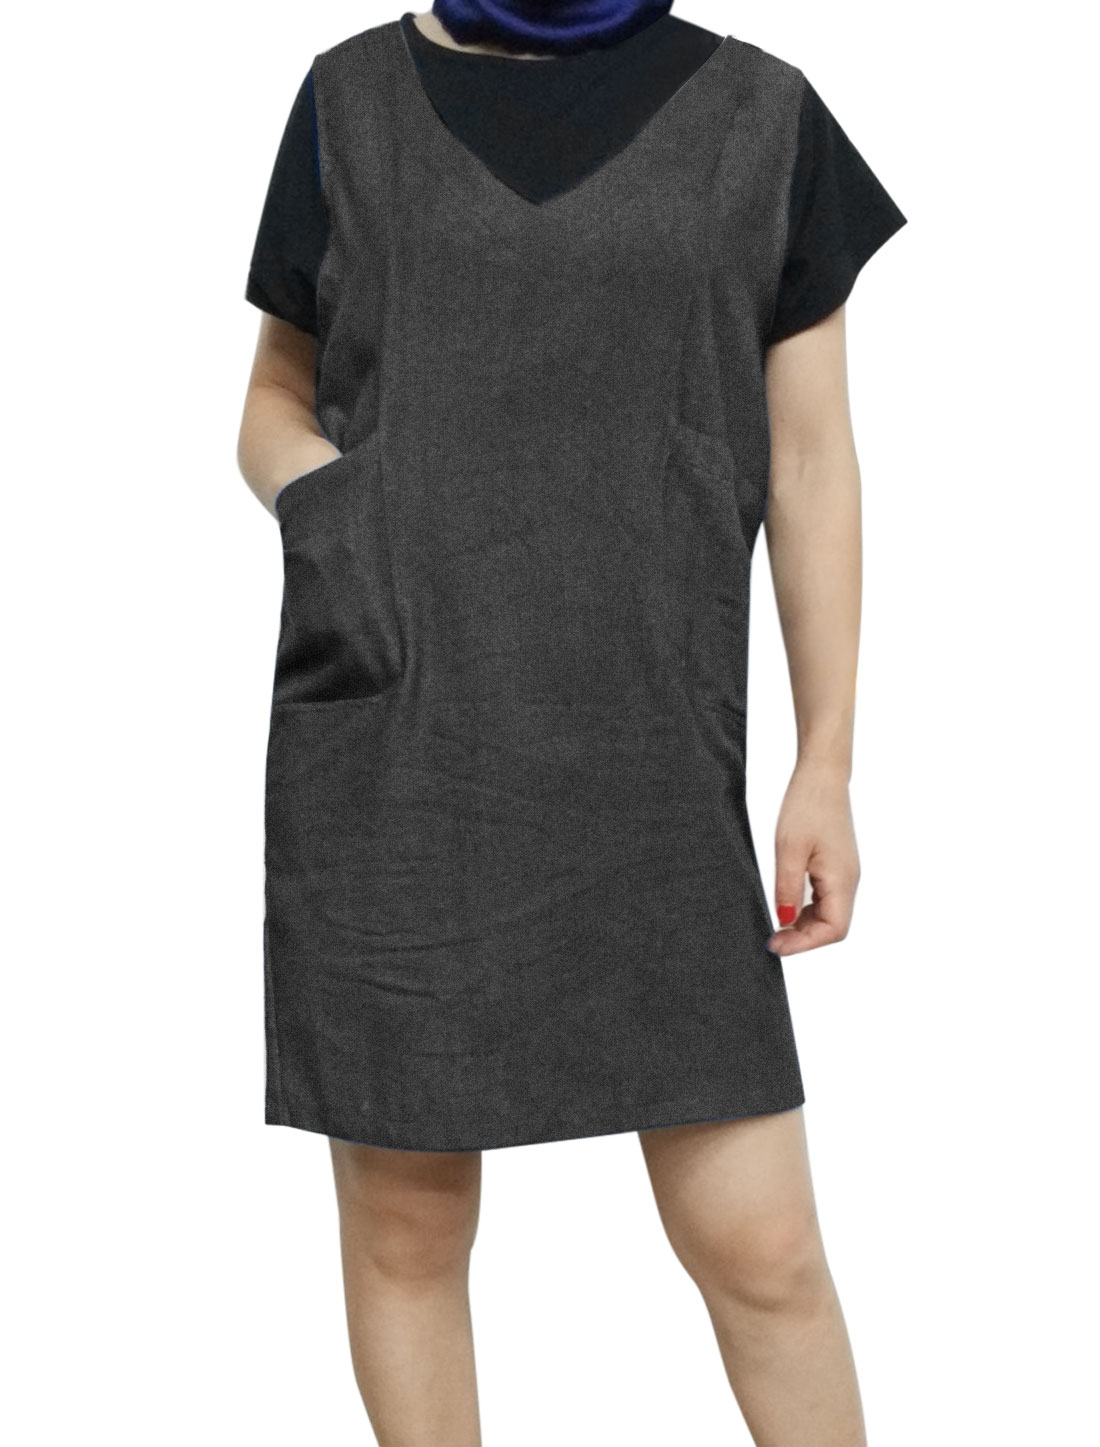 Women V Neck Sleeveless Pockets Front Loose Denim Straight Dress Black L